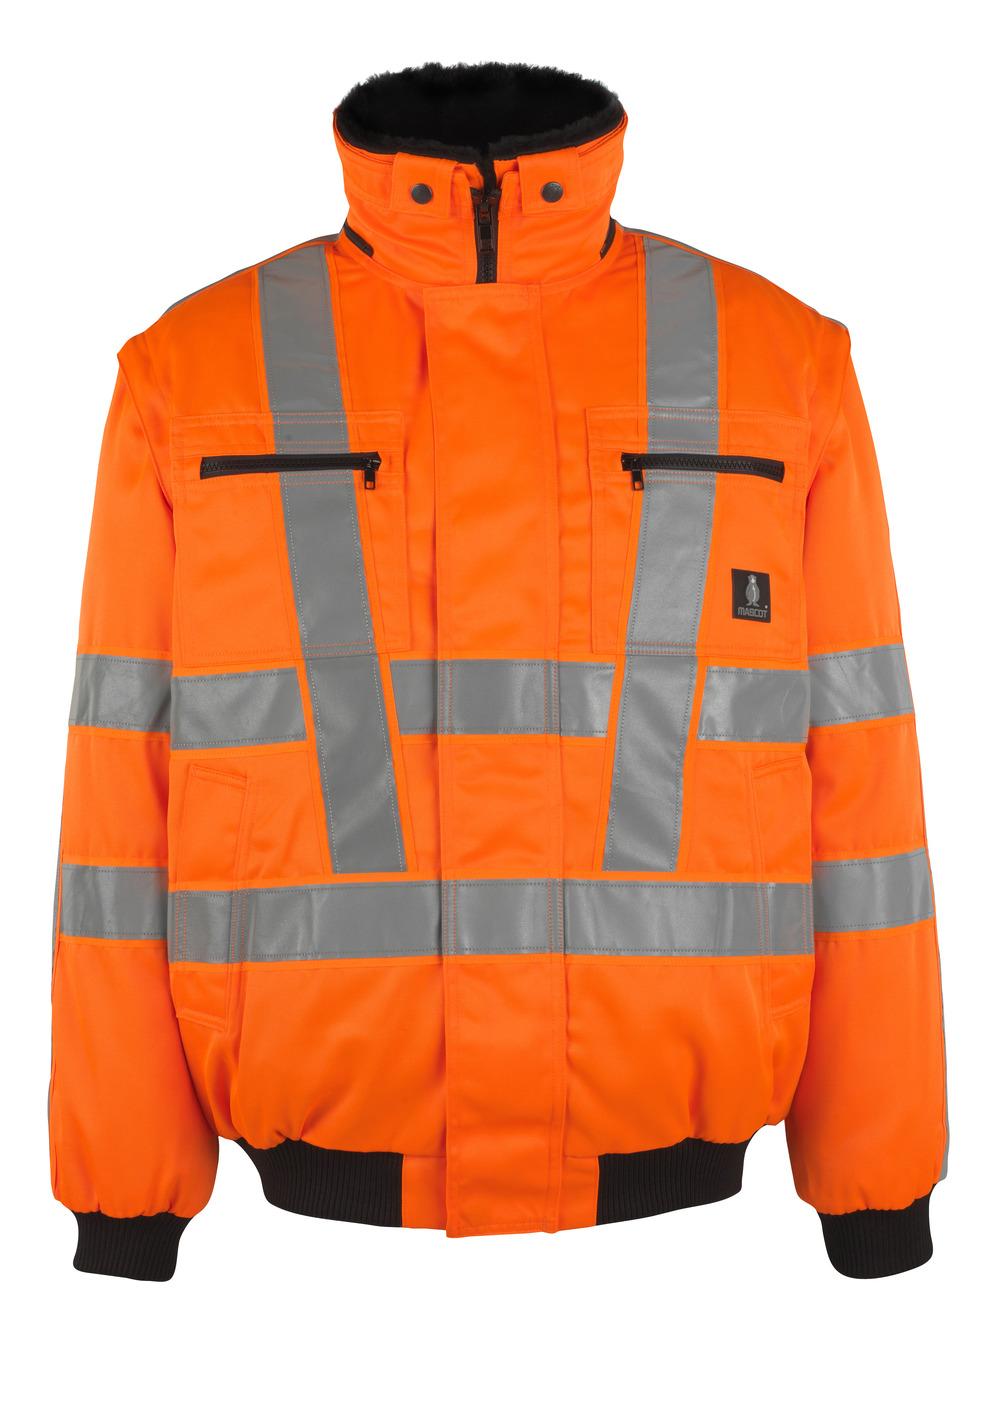 05020-660-14 Veste pilote - Hi-vis orange